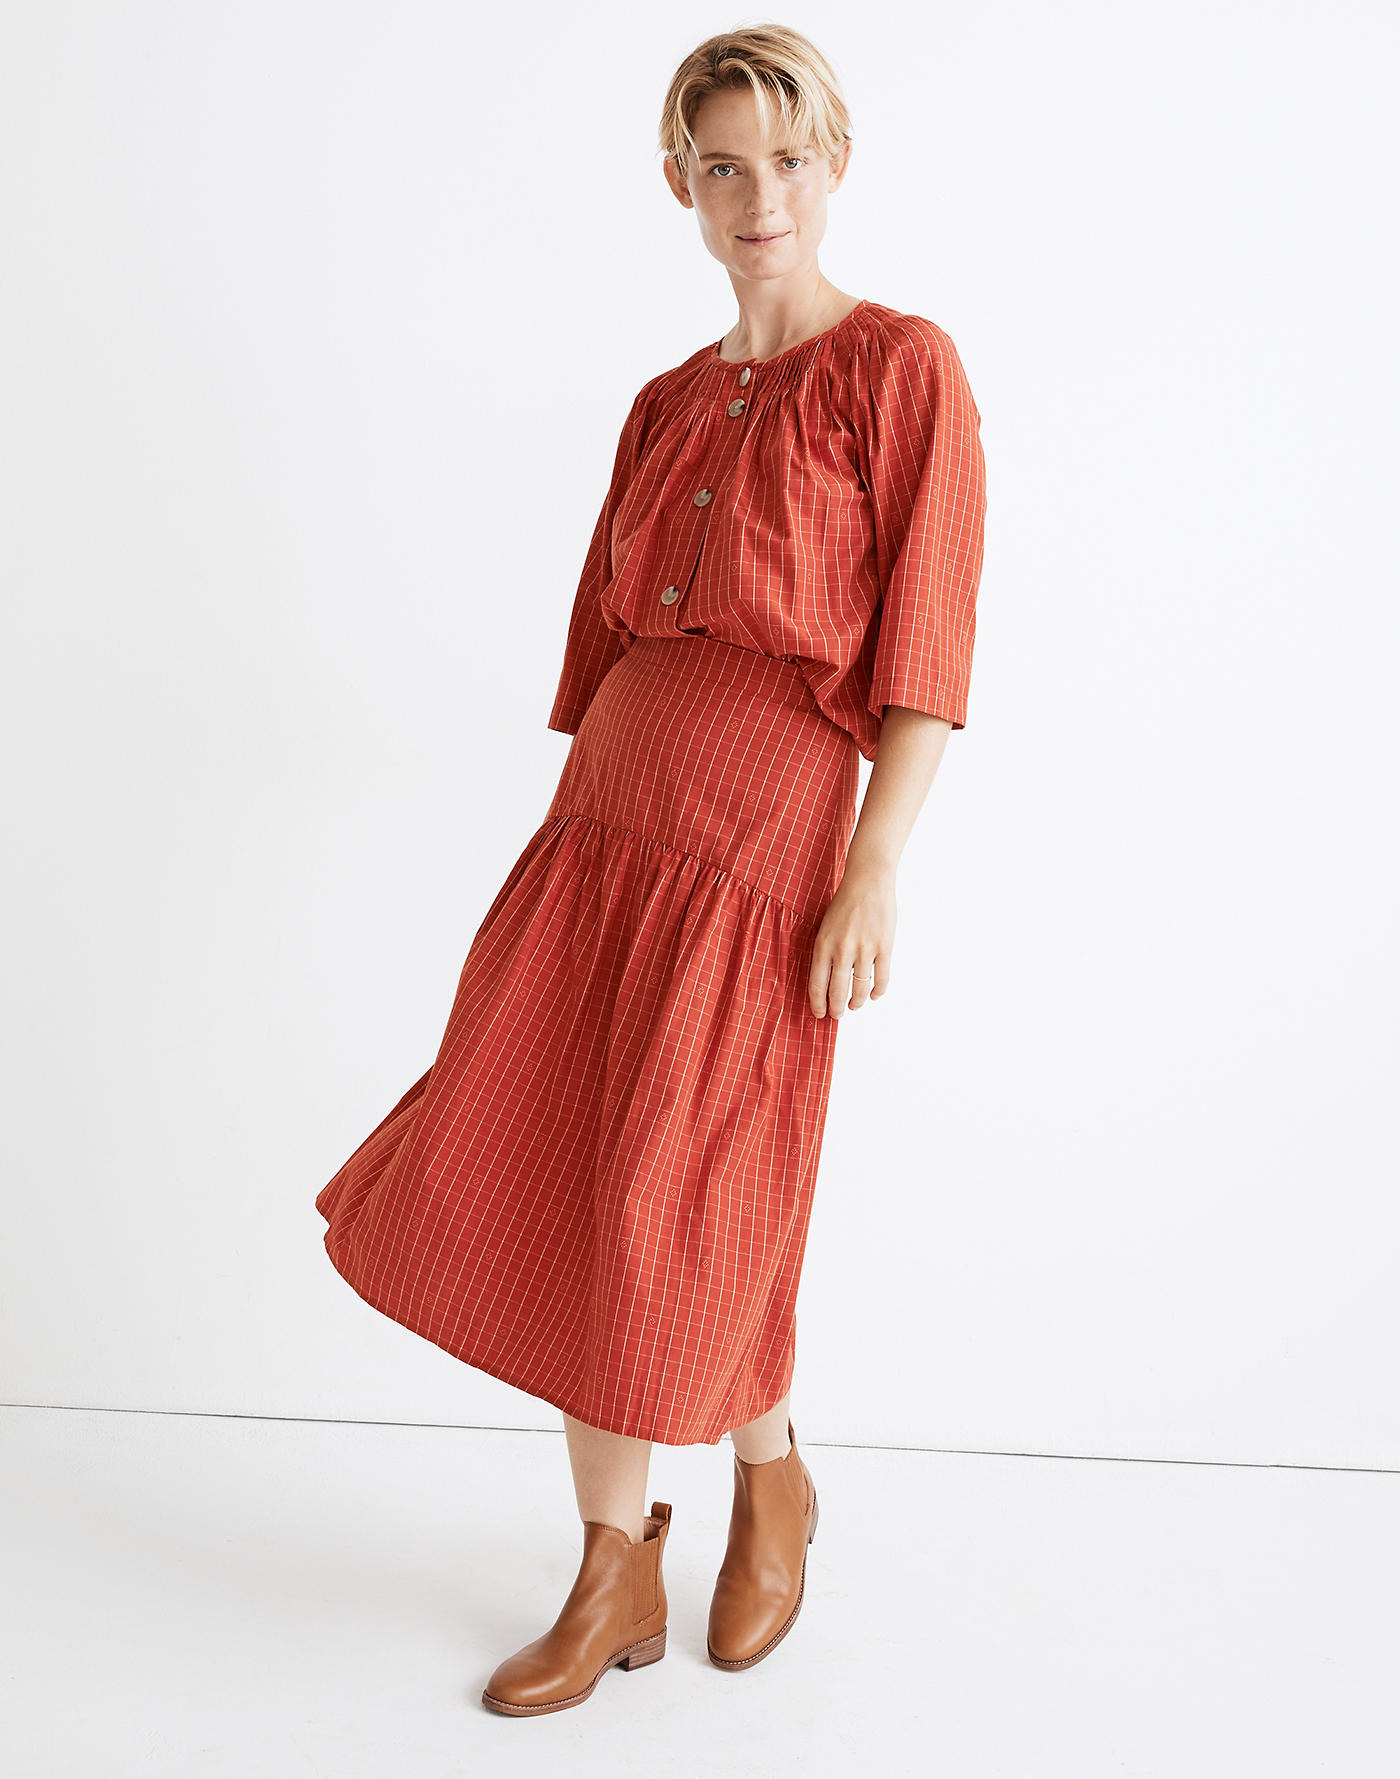 Model wearing red plaid skirt